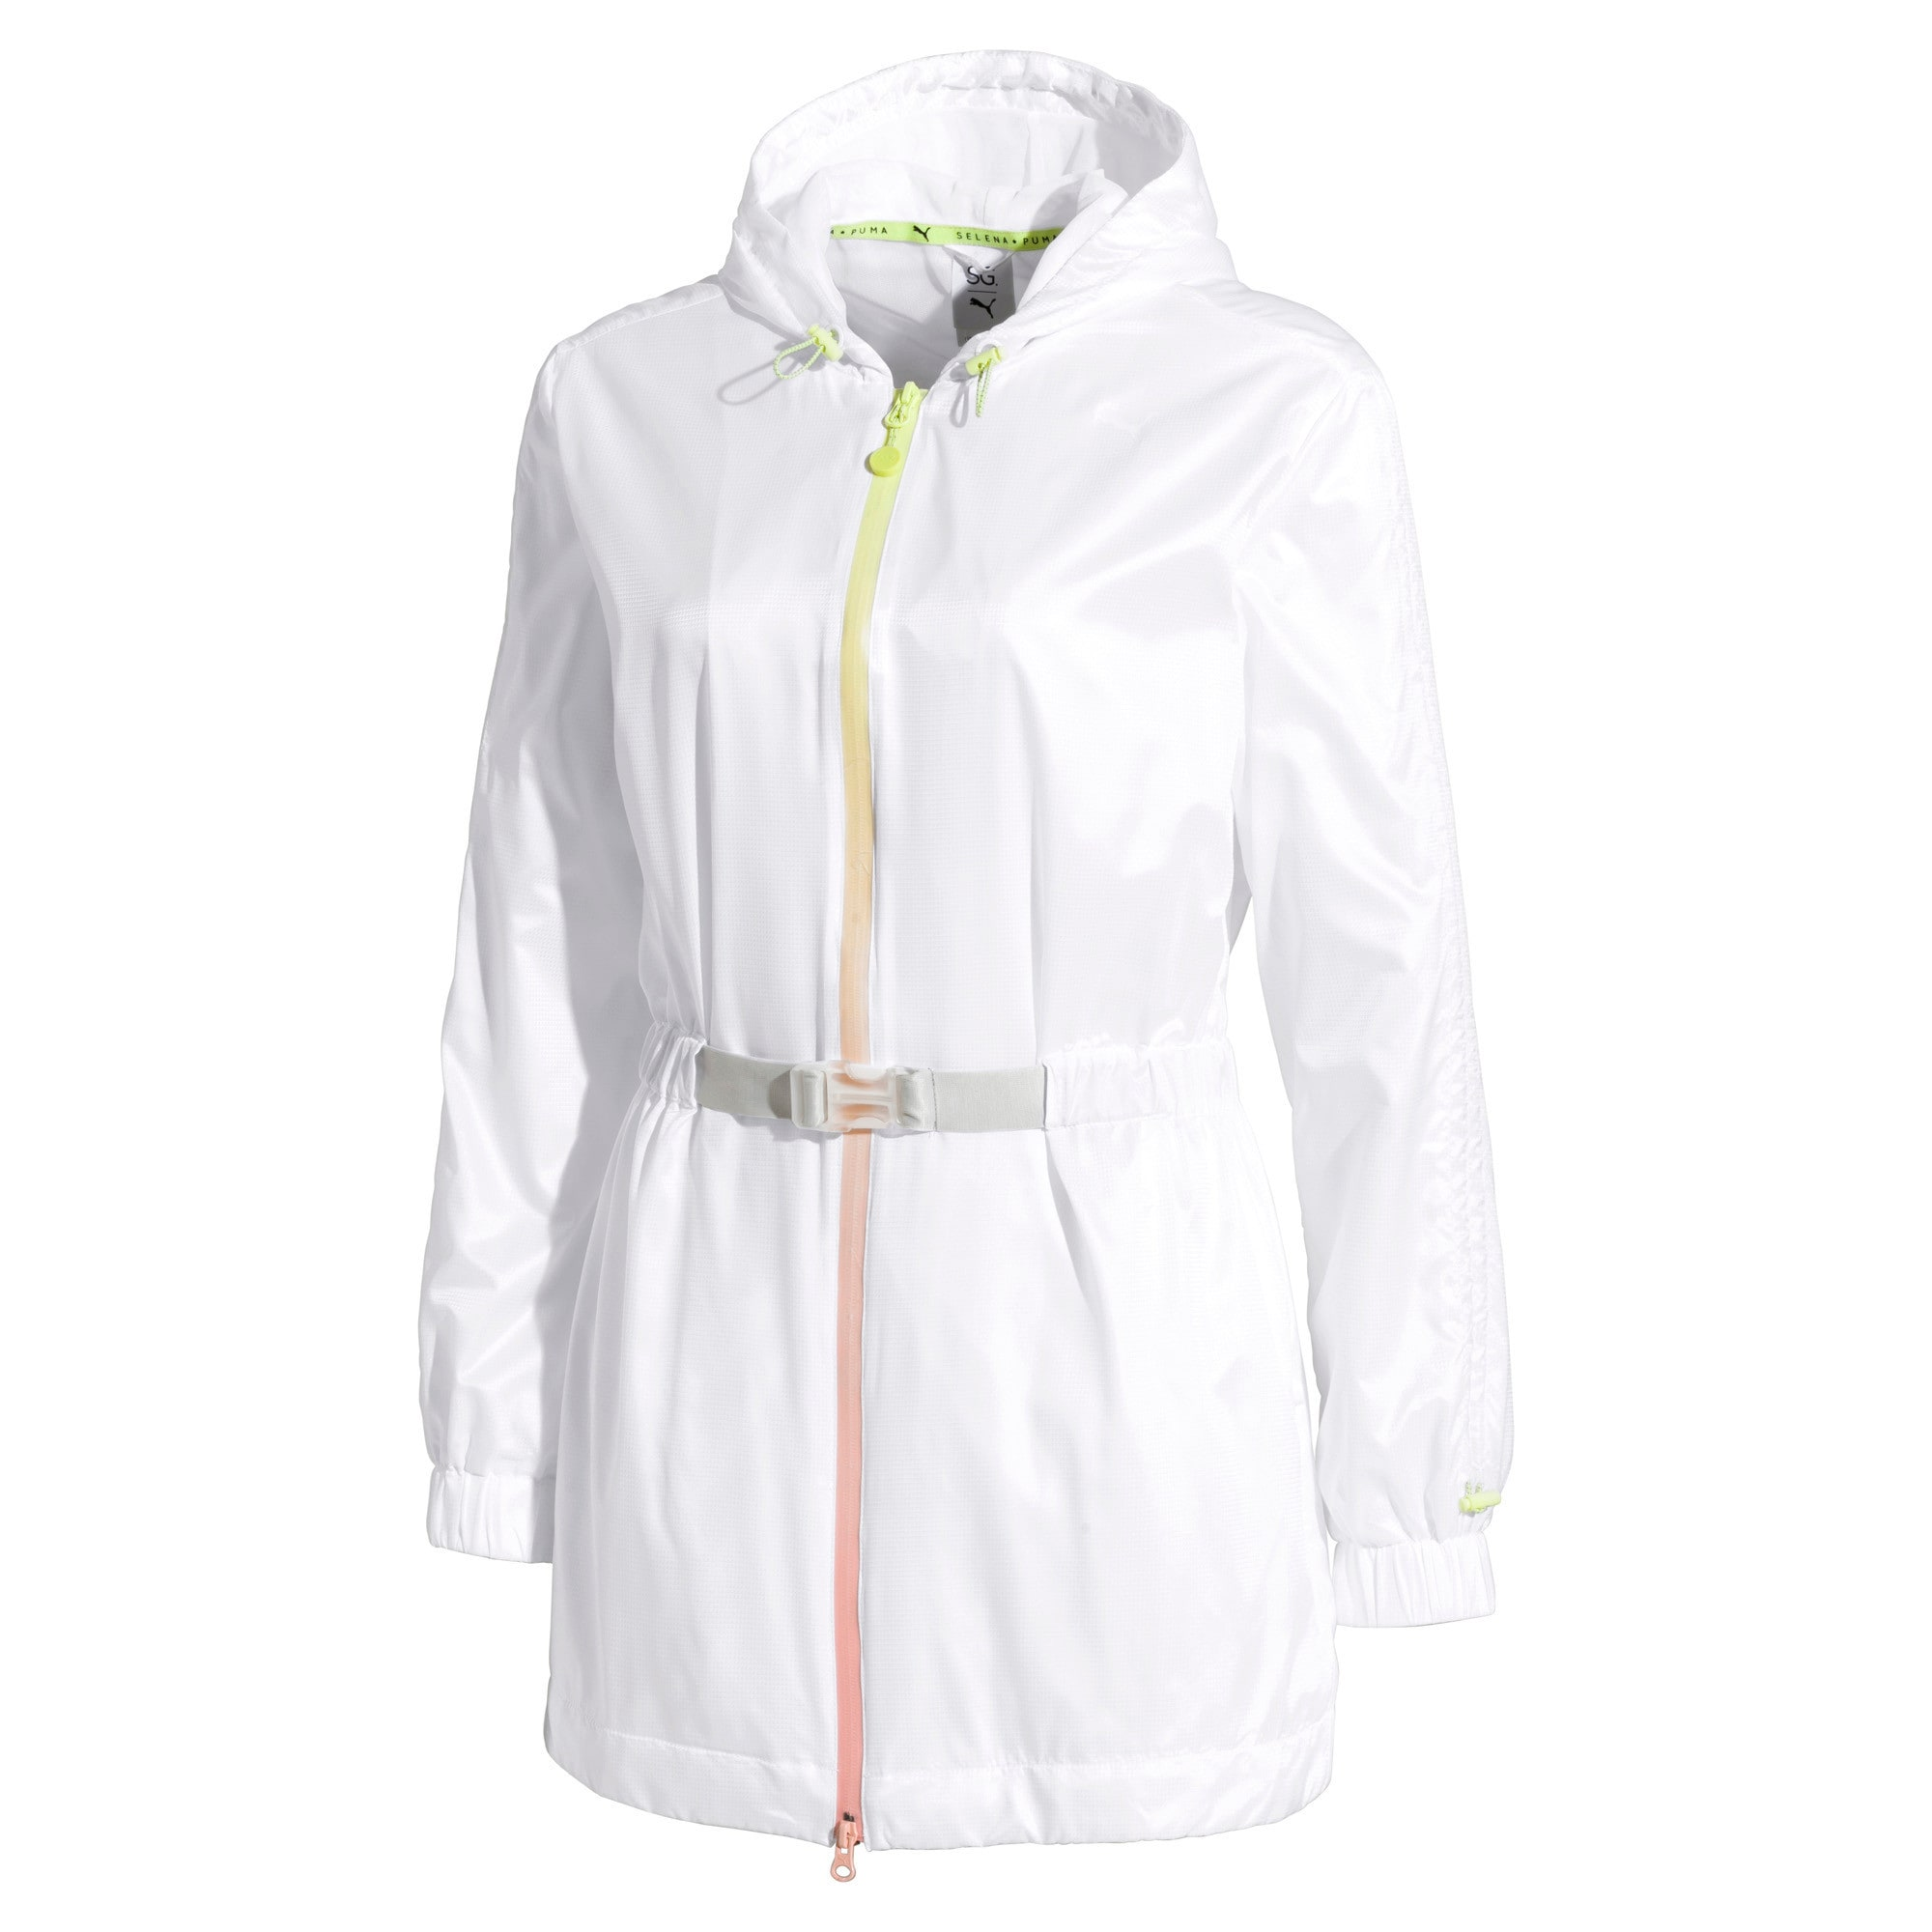 Thumbnail 4 of PUMA x SELENA GOMEZ Hooded Women's Jacket, Puma White, medium